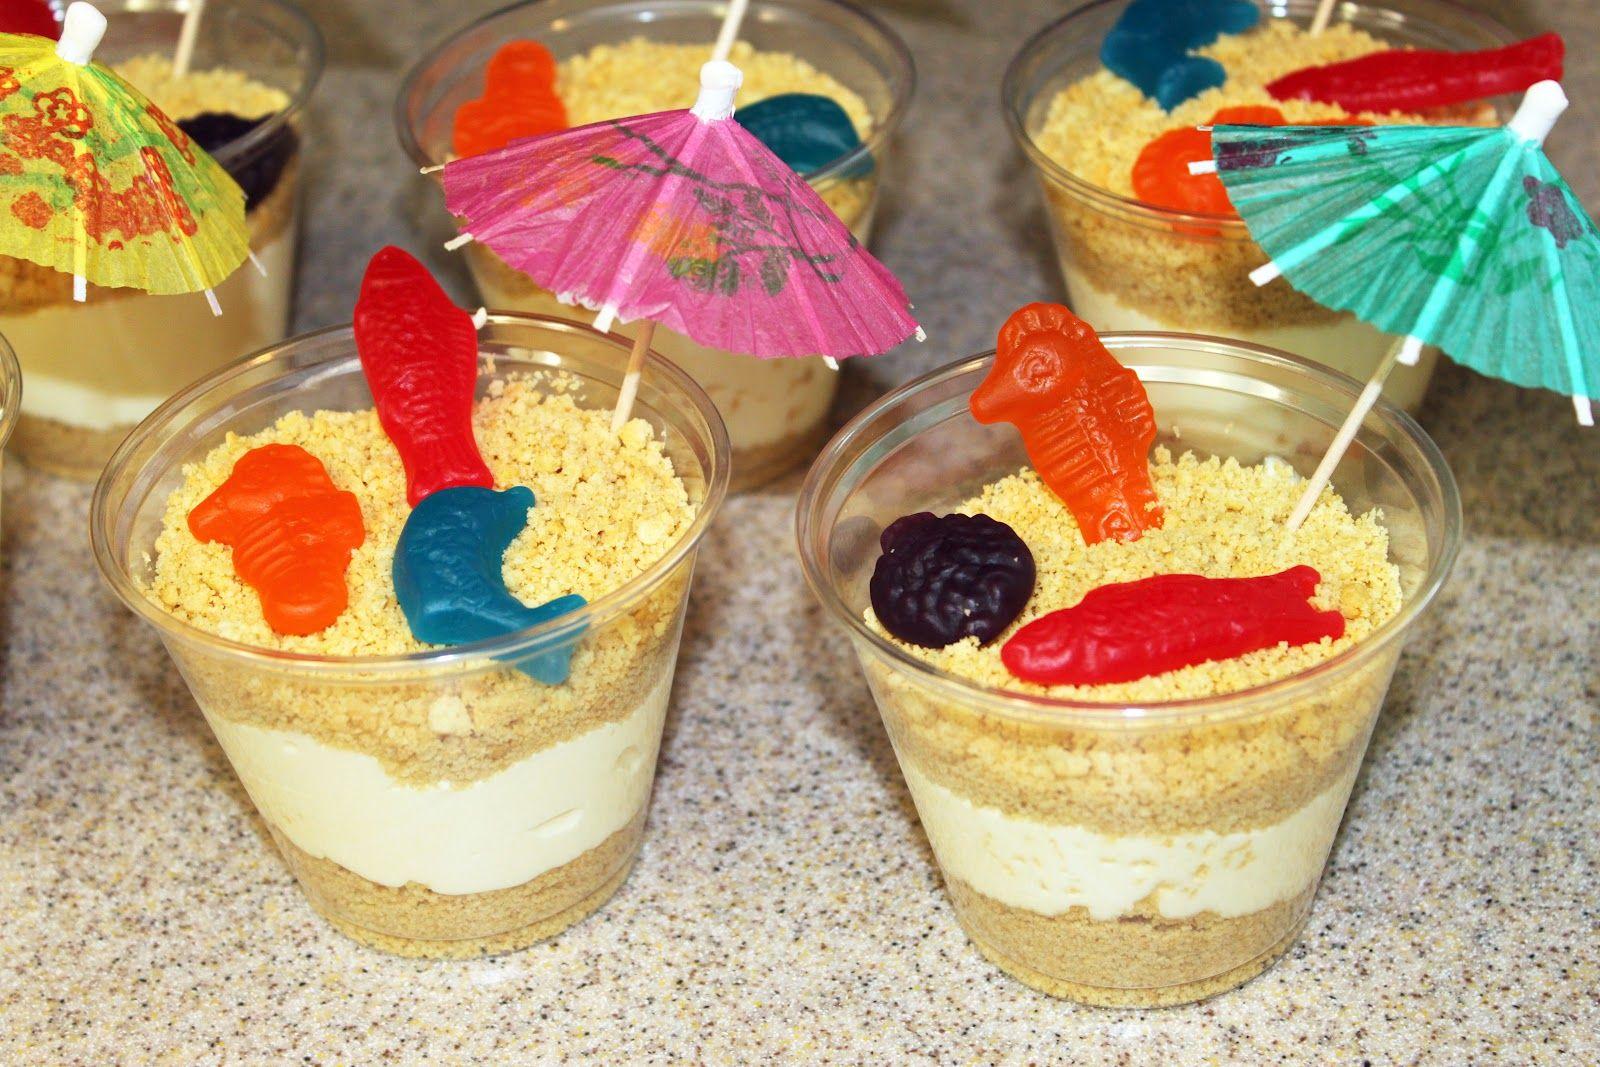 Thanksgiving Baking Activities For Kids